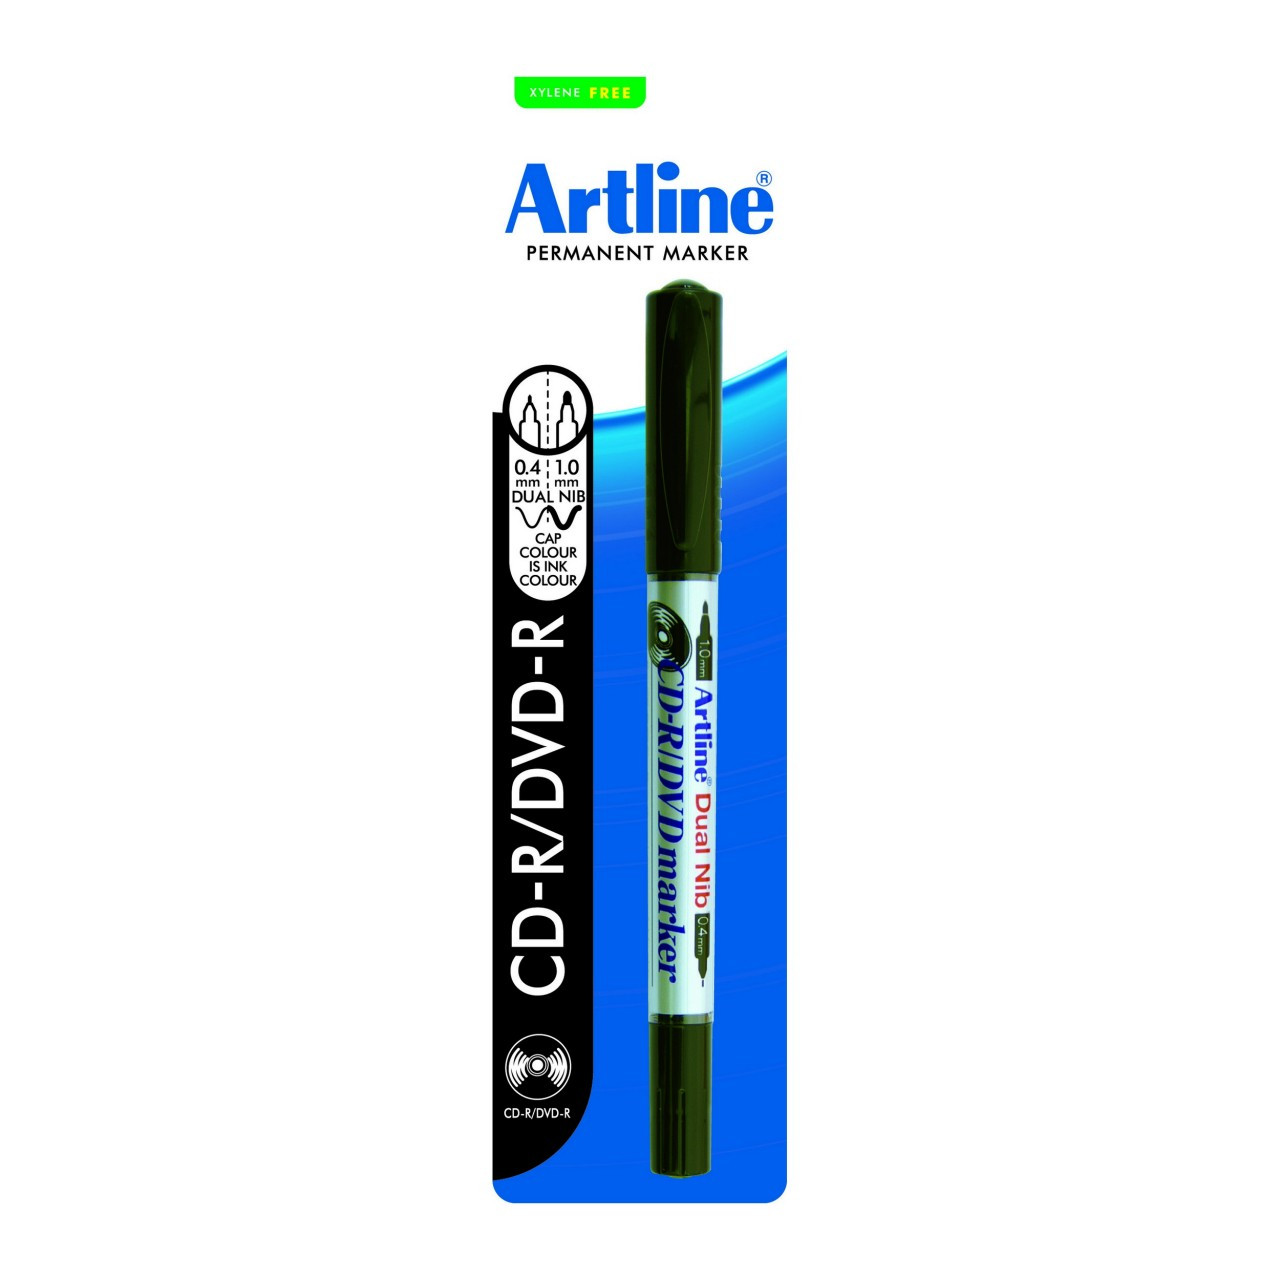 Artline 841 Cdr/Dvd Marker Dual Nib Hangsell Black 1 Pce X 6 Units